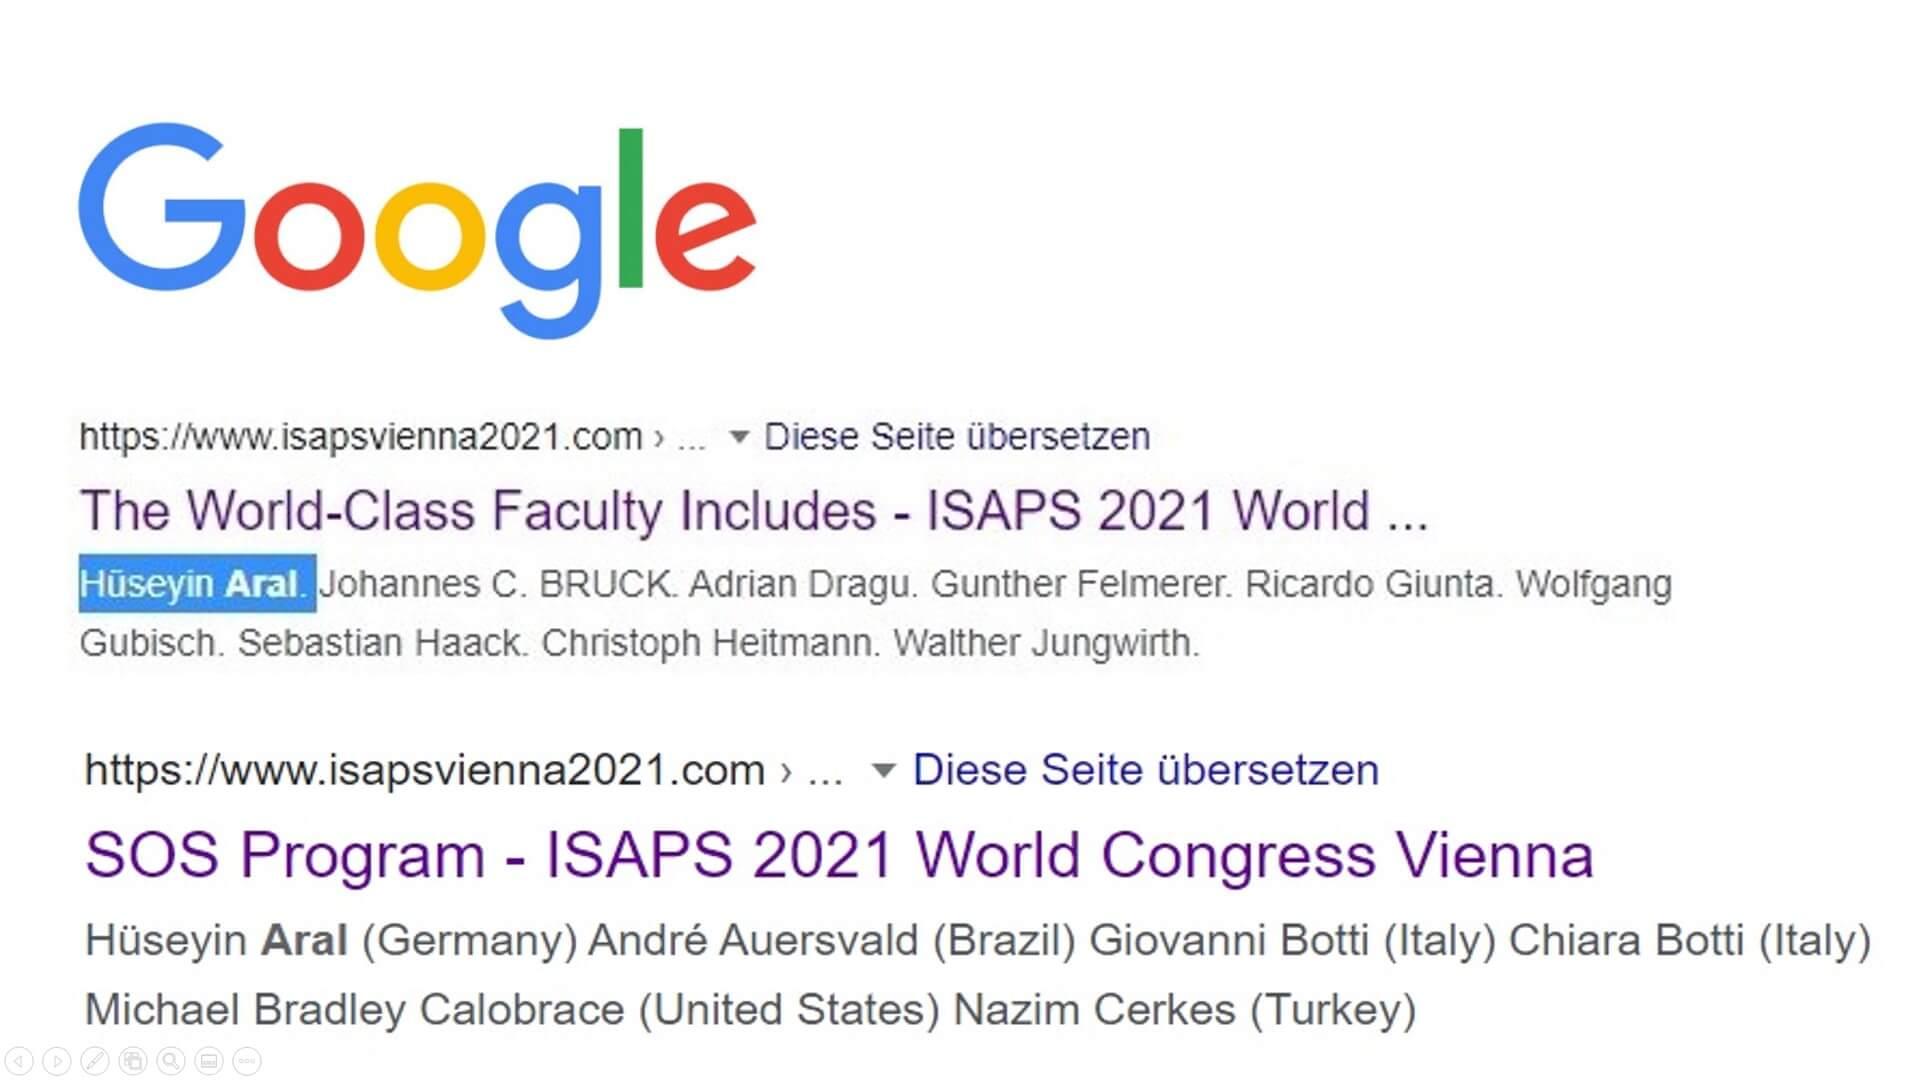 Google ISAPS 2021 Vienna